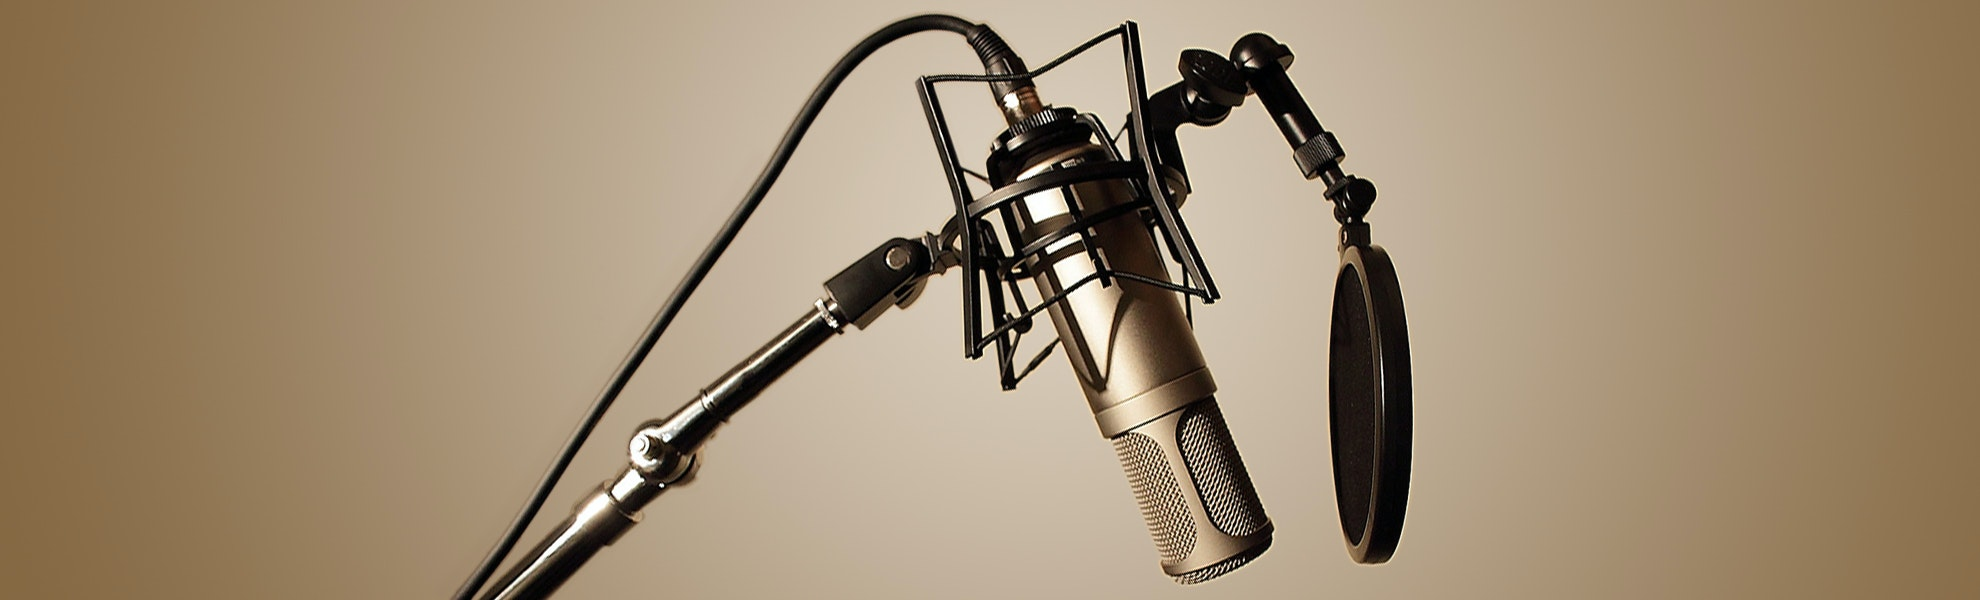 RØDE K2 Microphone